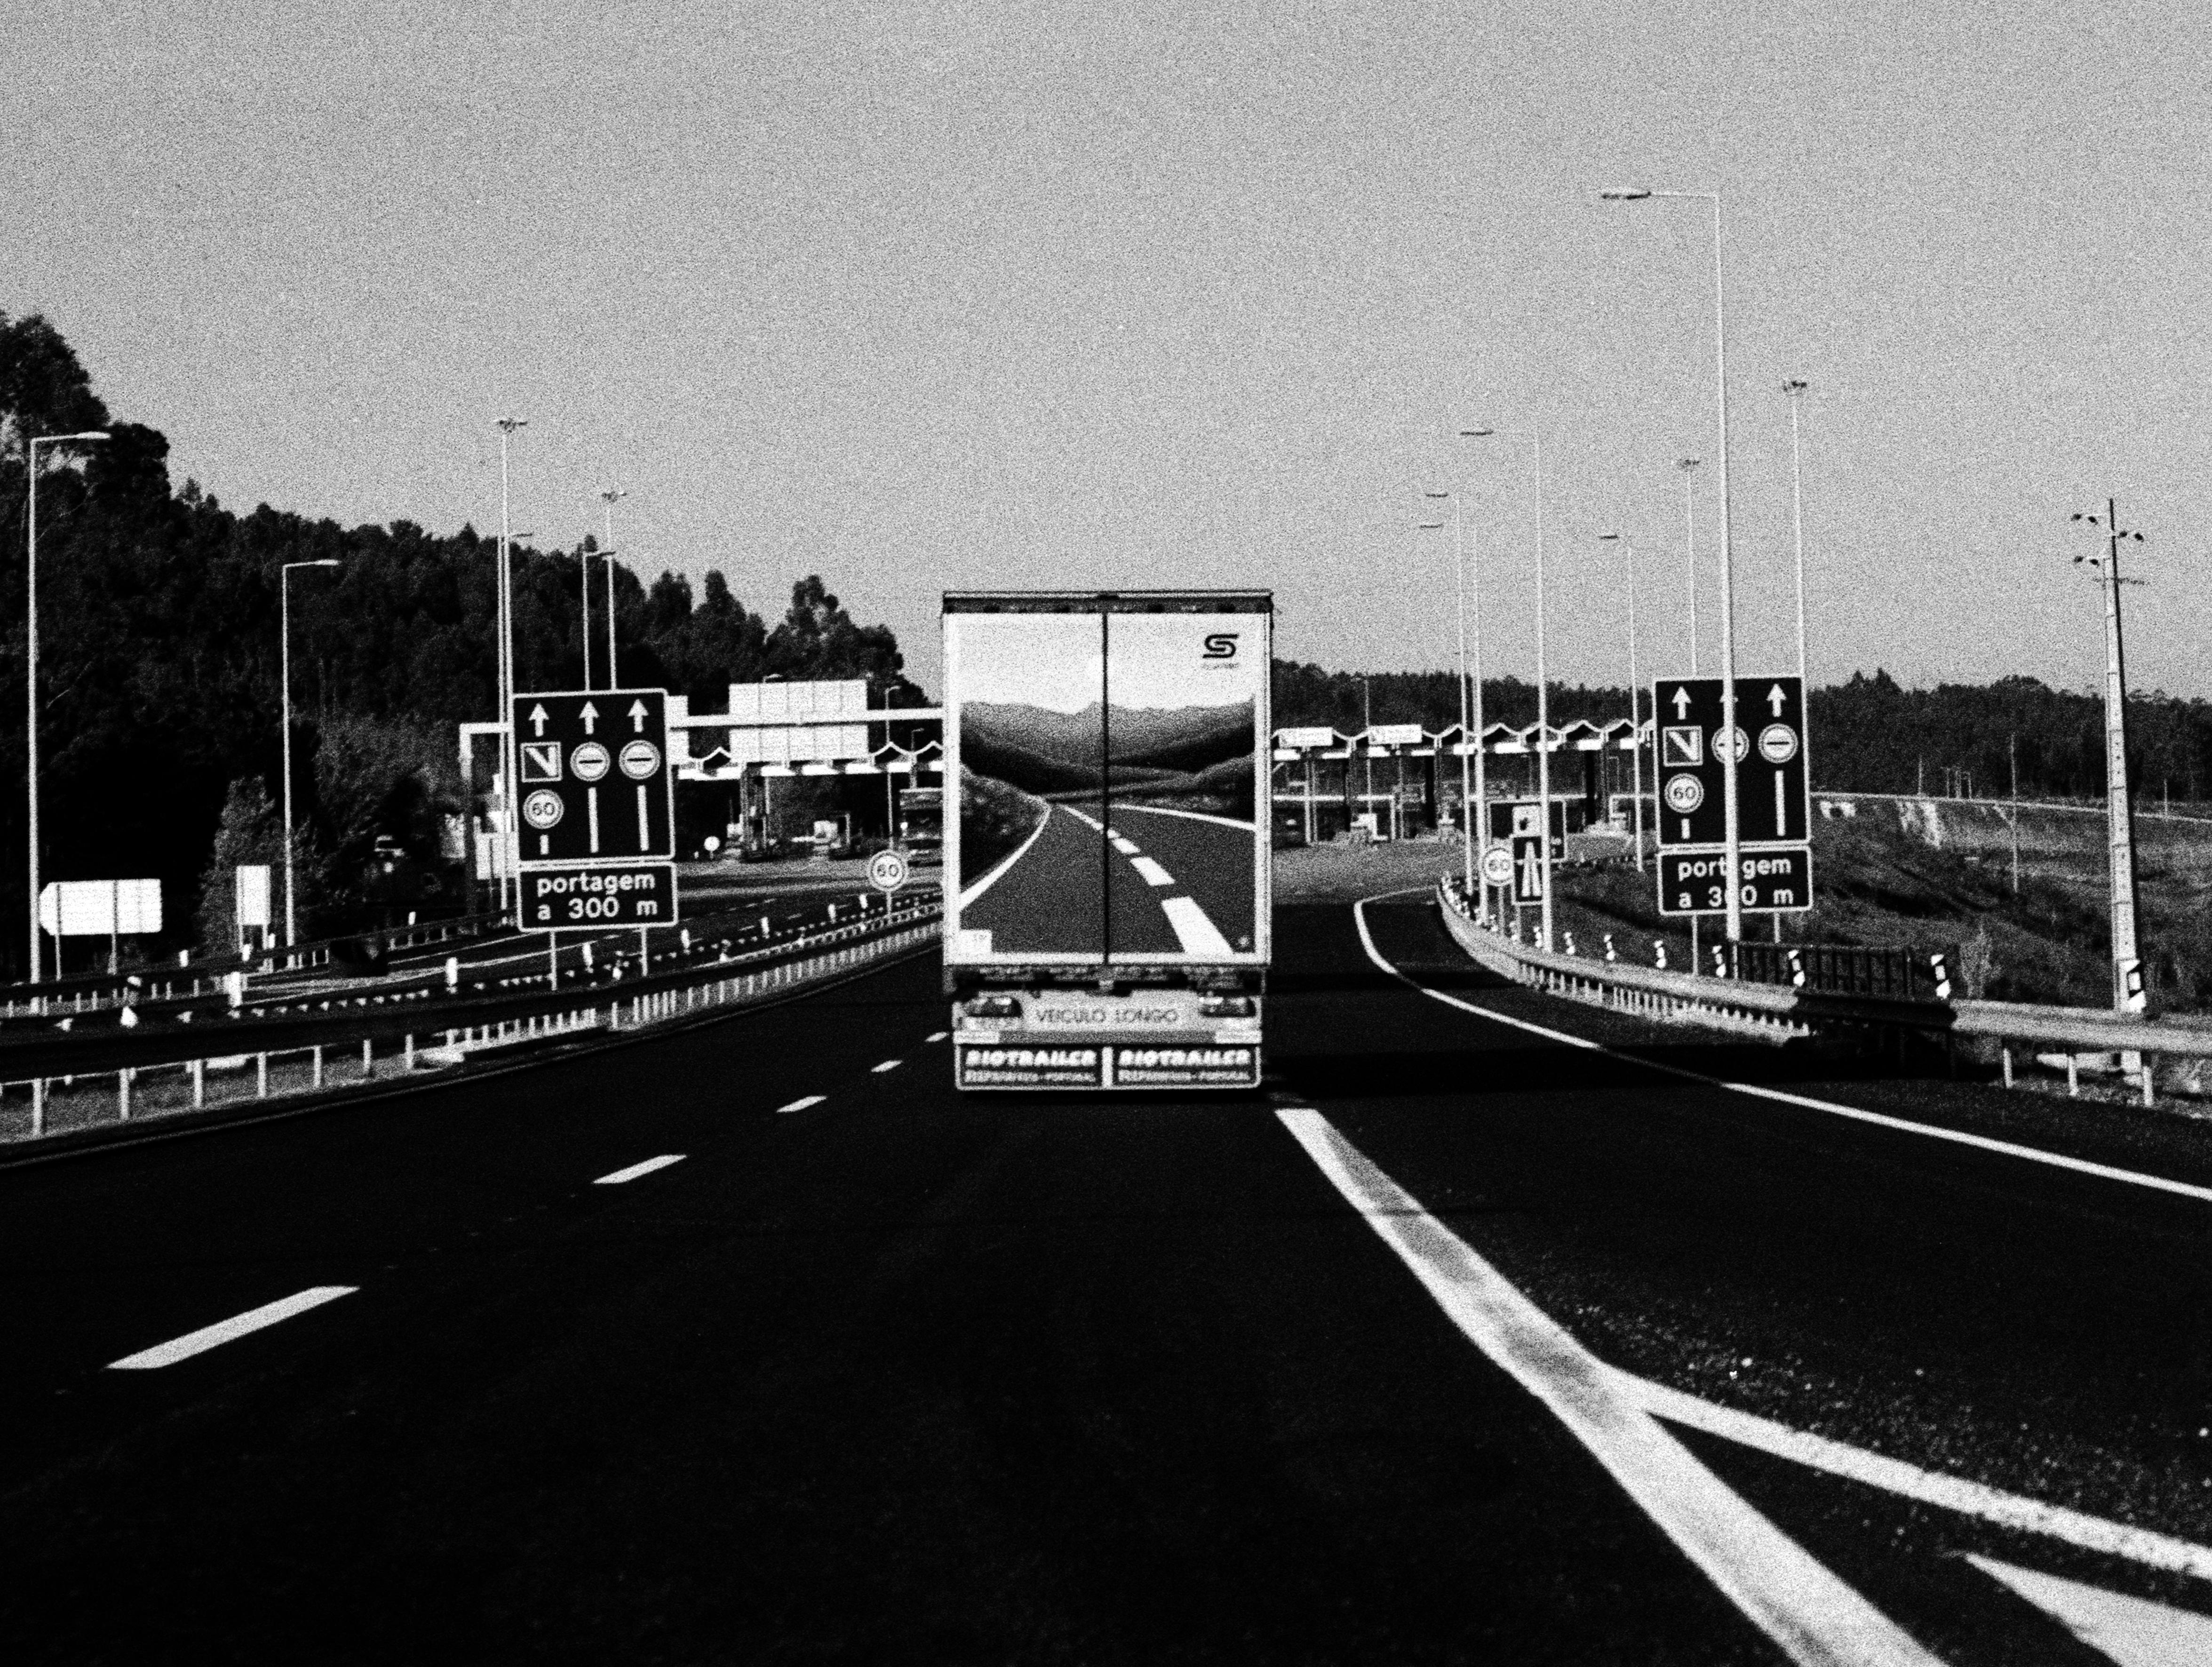 Highway, Portugal 2003 /Gelatin Silver Print/ Signed